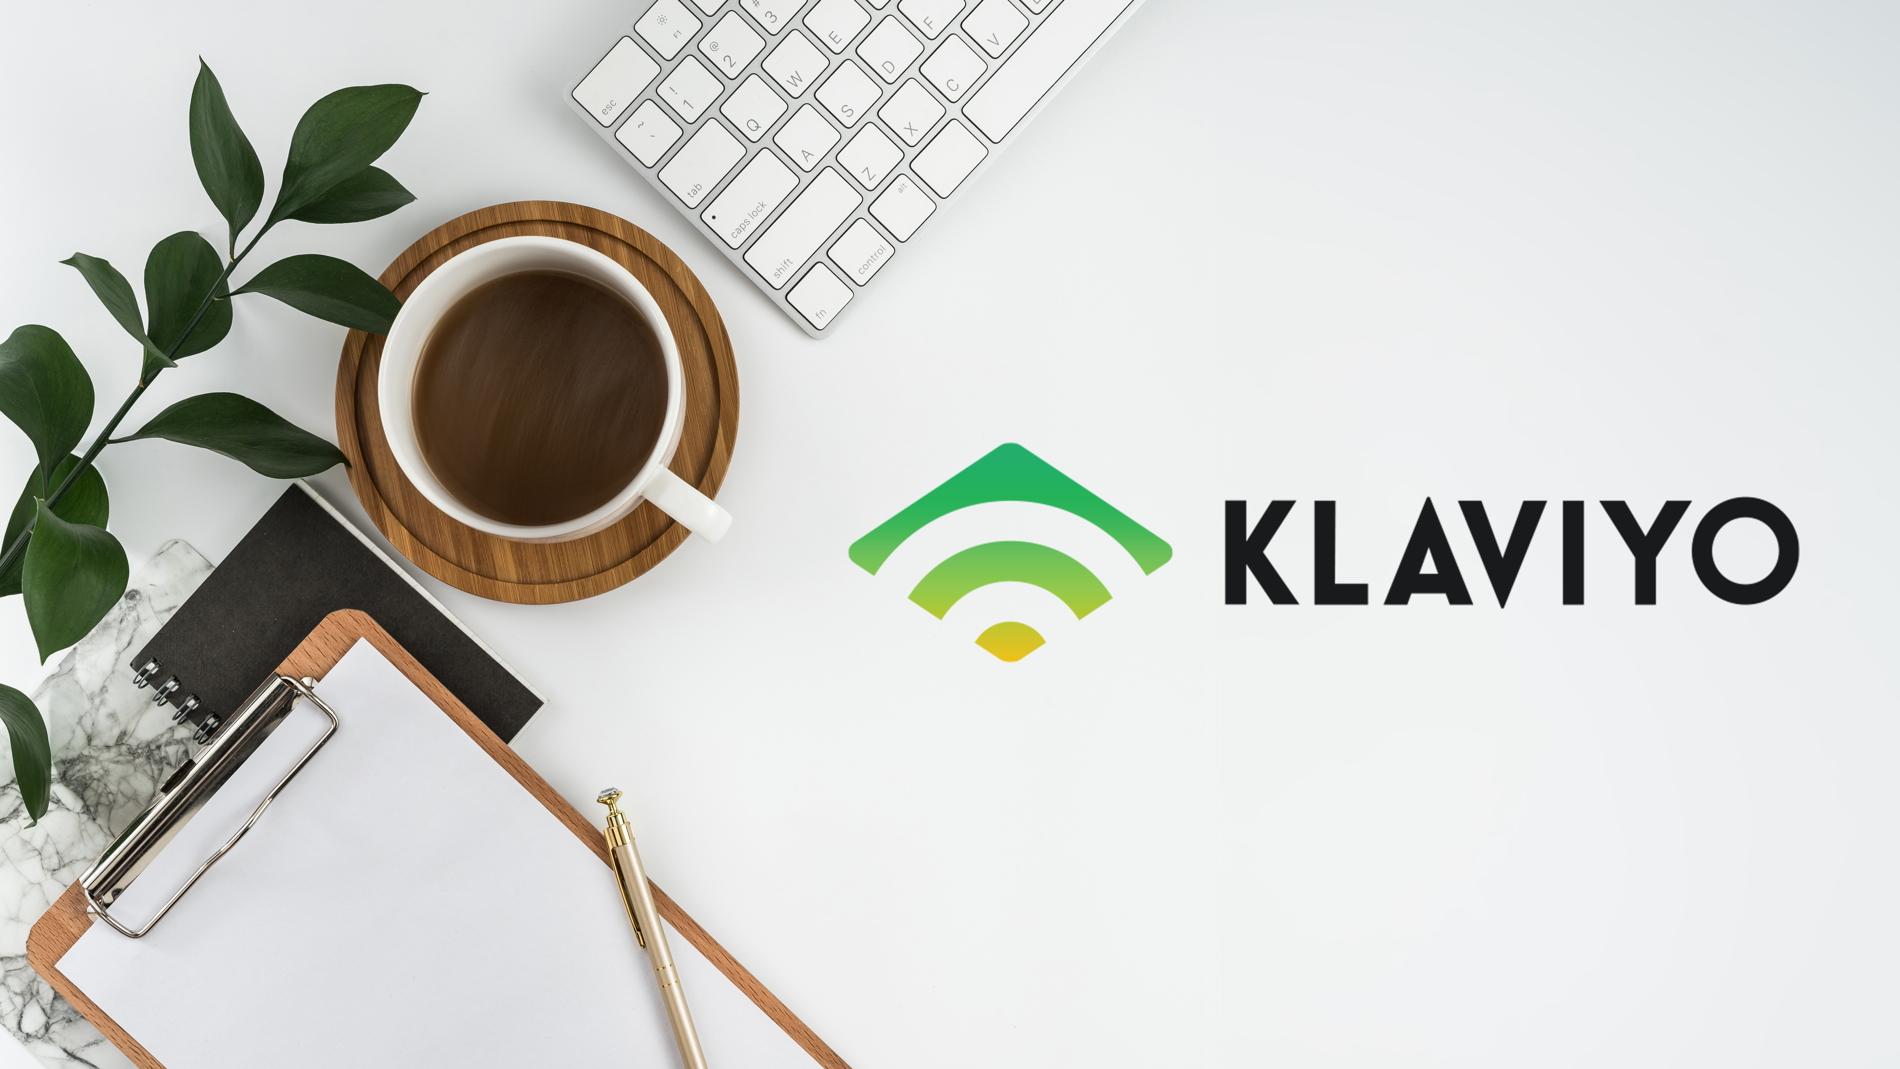 Klaviyo is a good alternative for Bronton email templates.